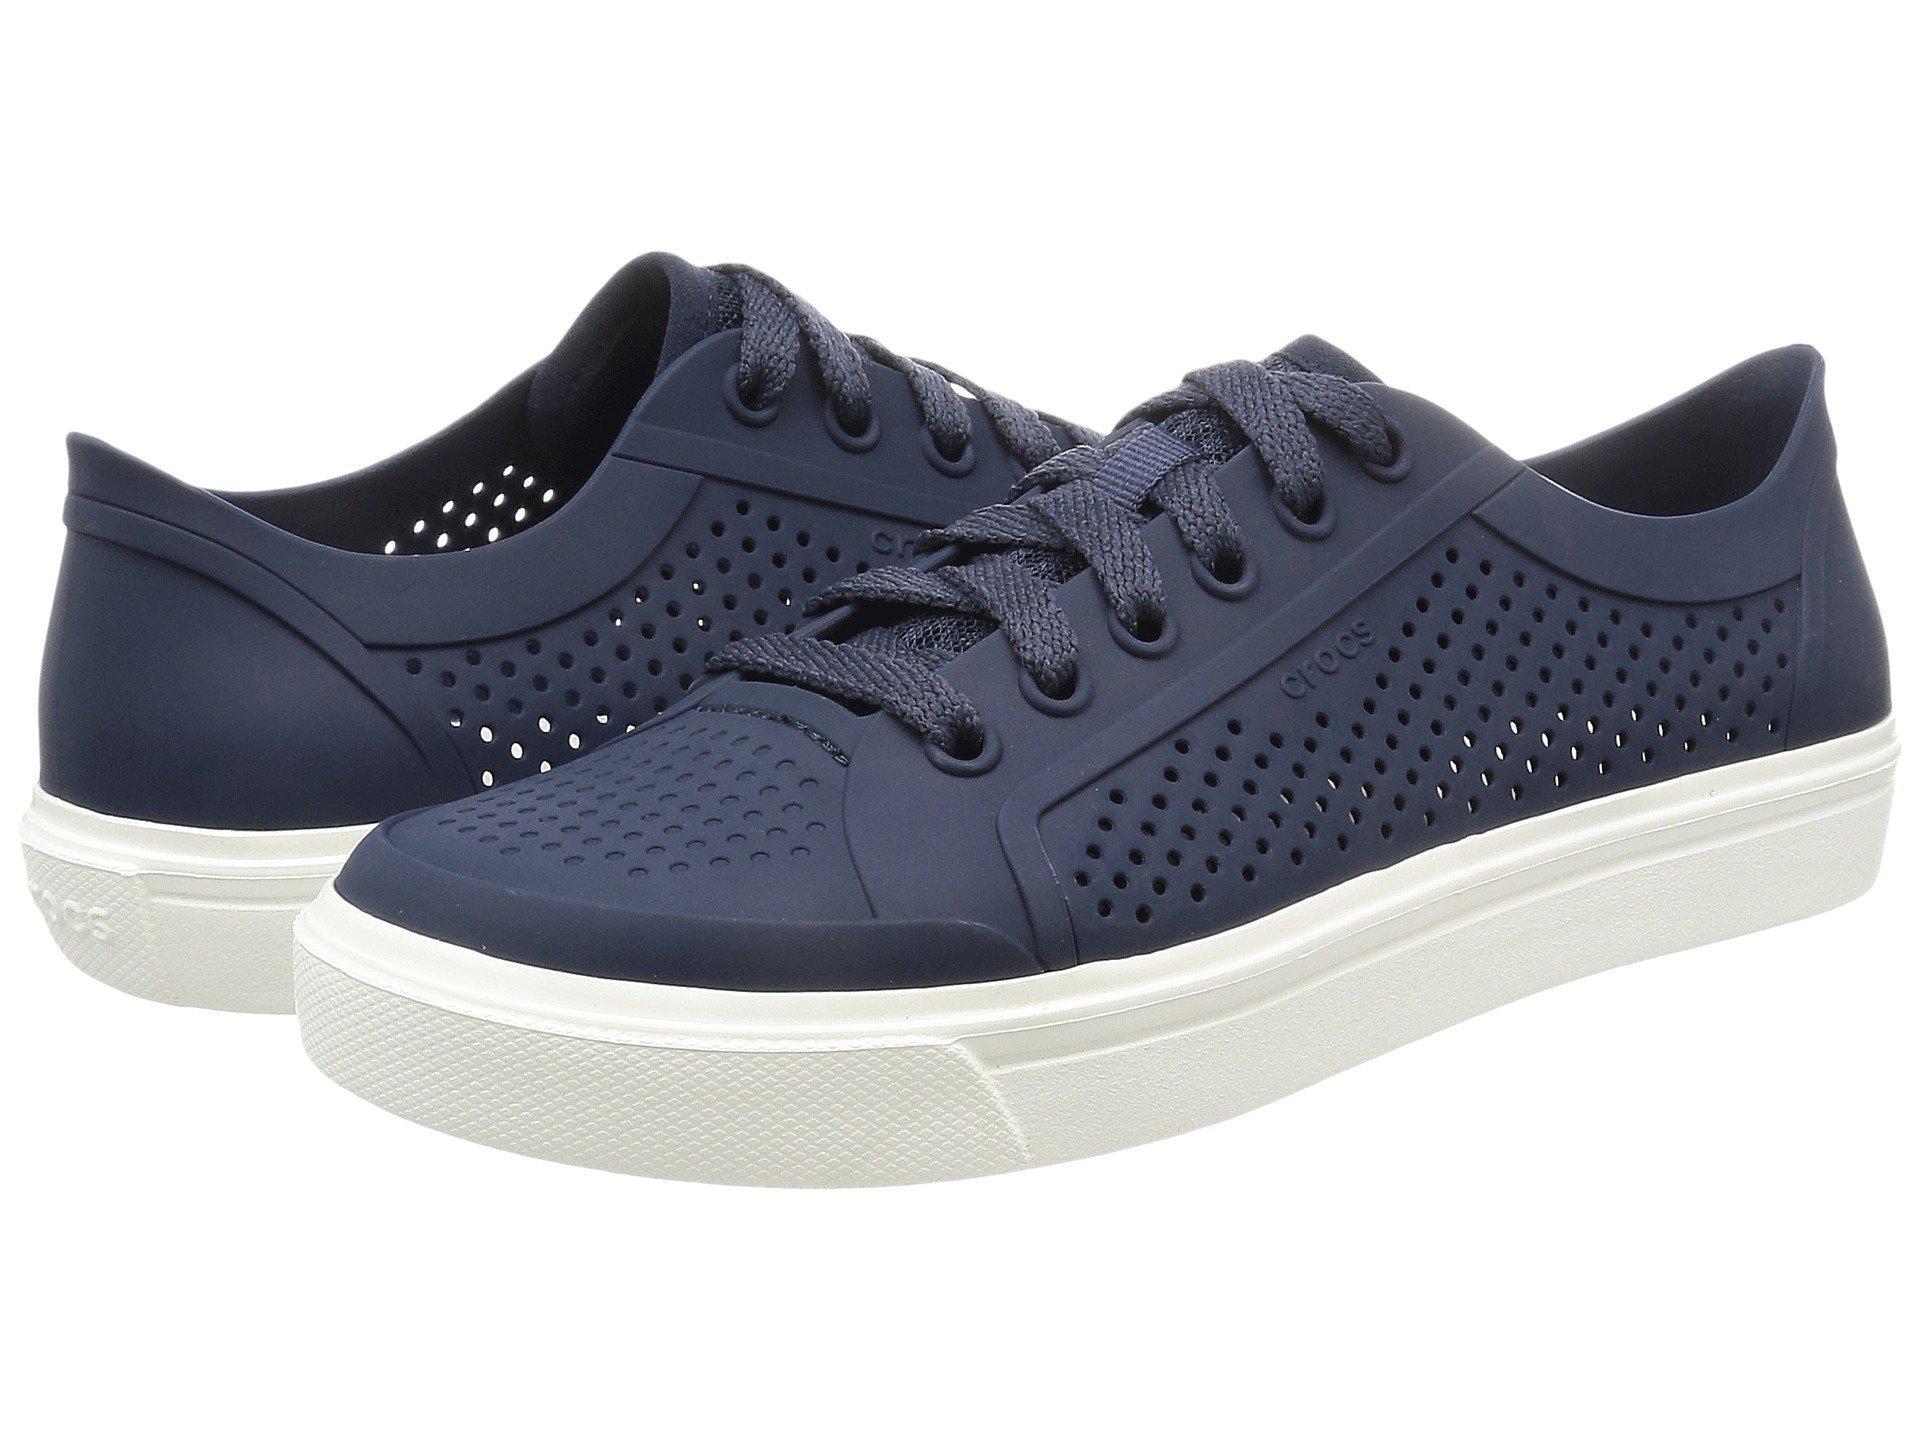 d093c89f73e Lyst - Crocs™ Citilane Roka Court Sneaker in Blue for Men - Save ...